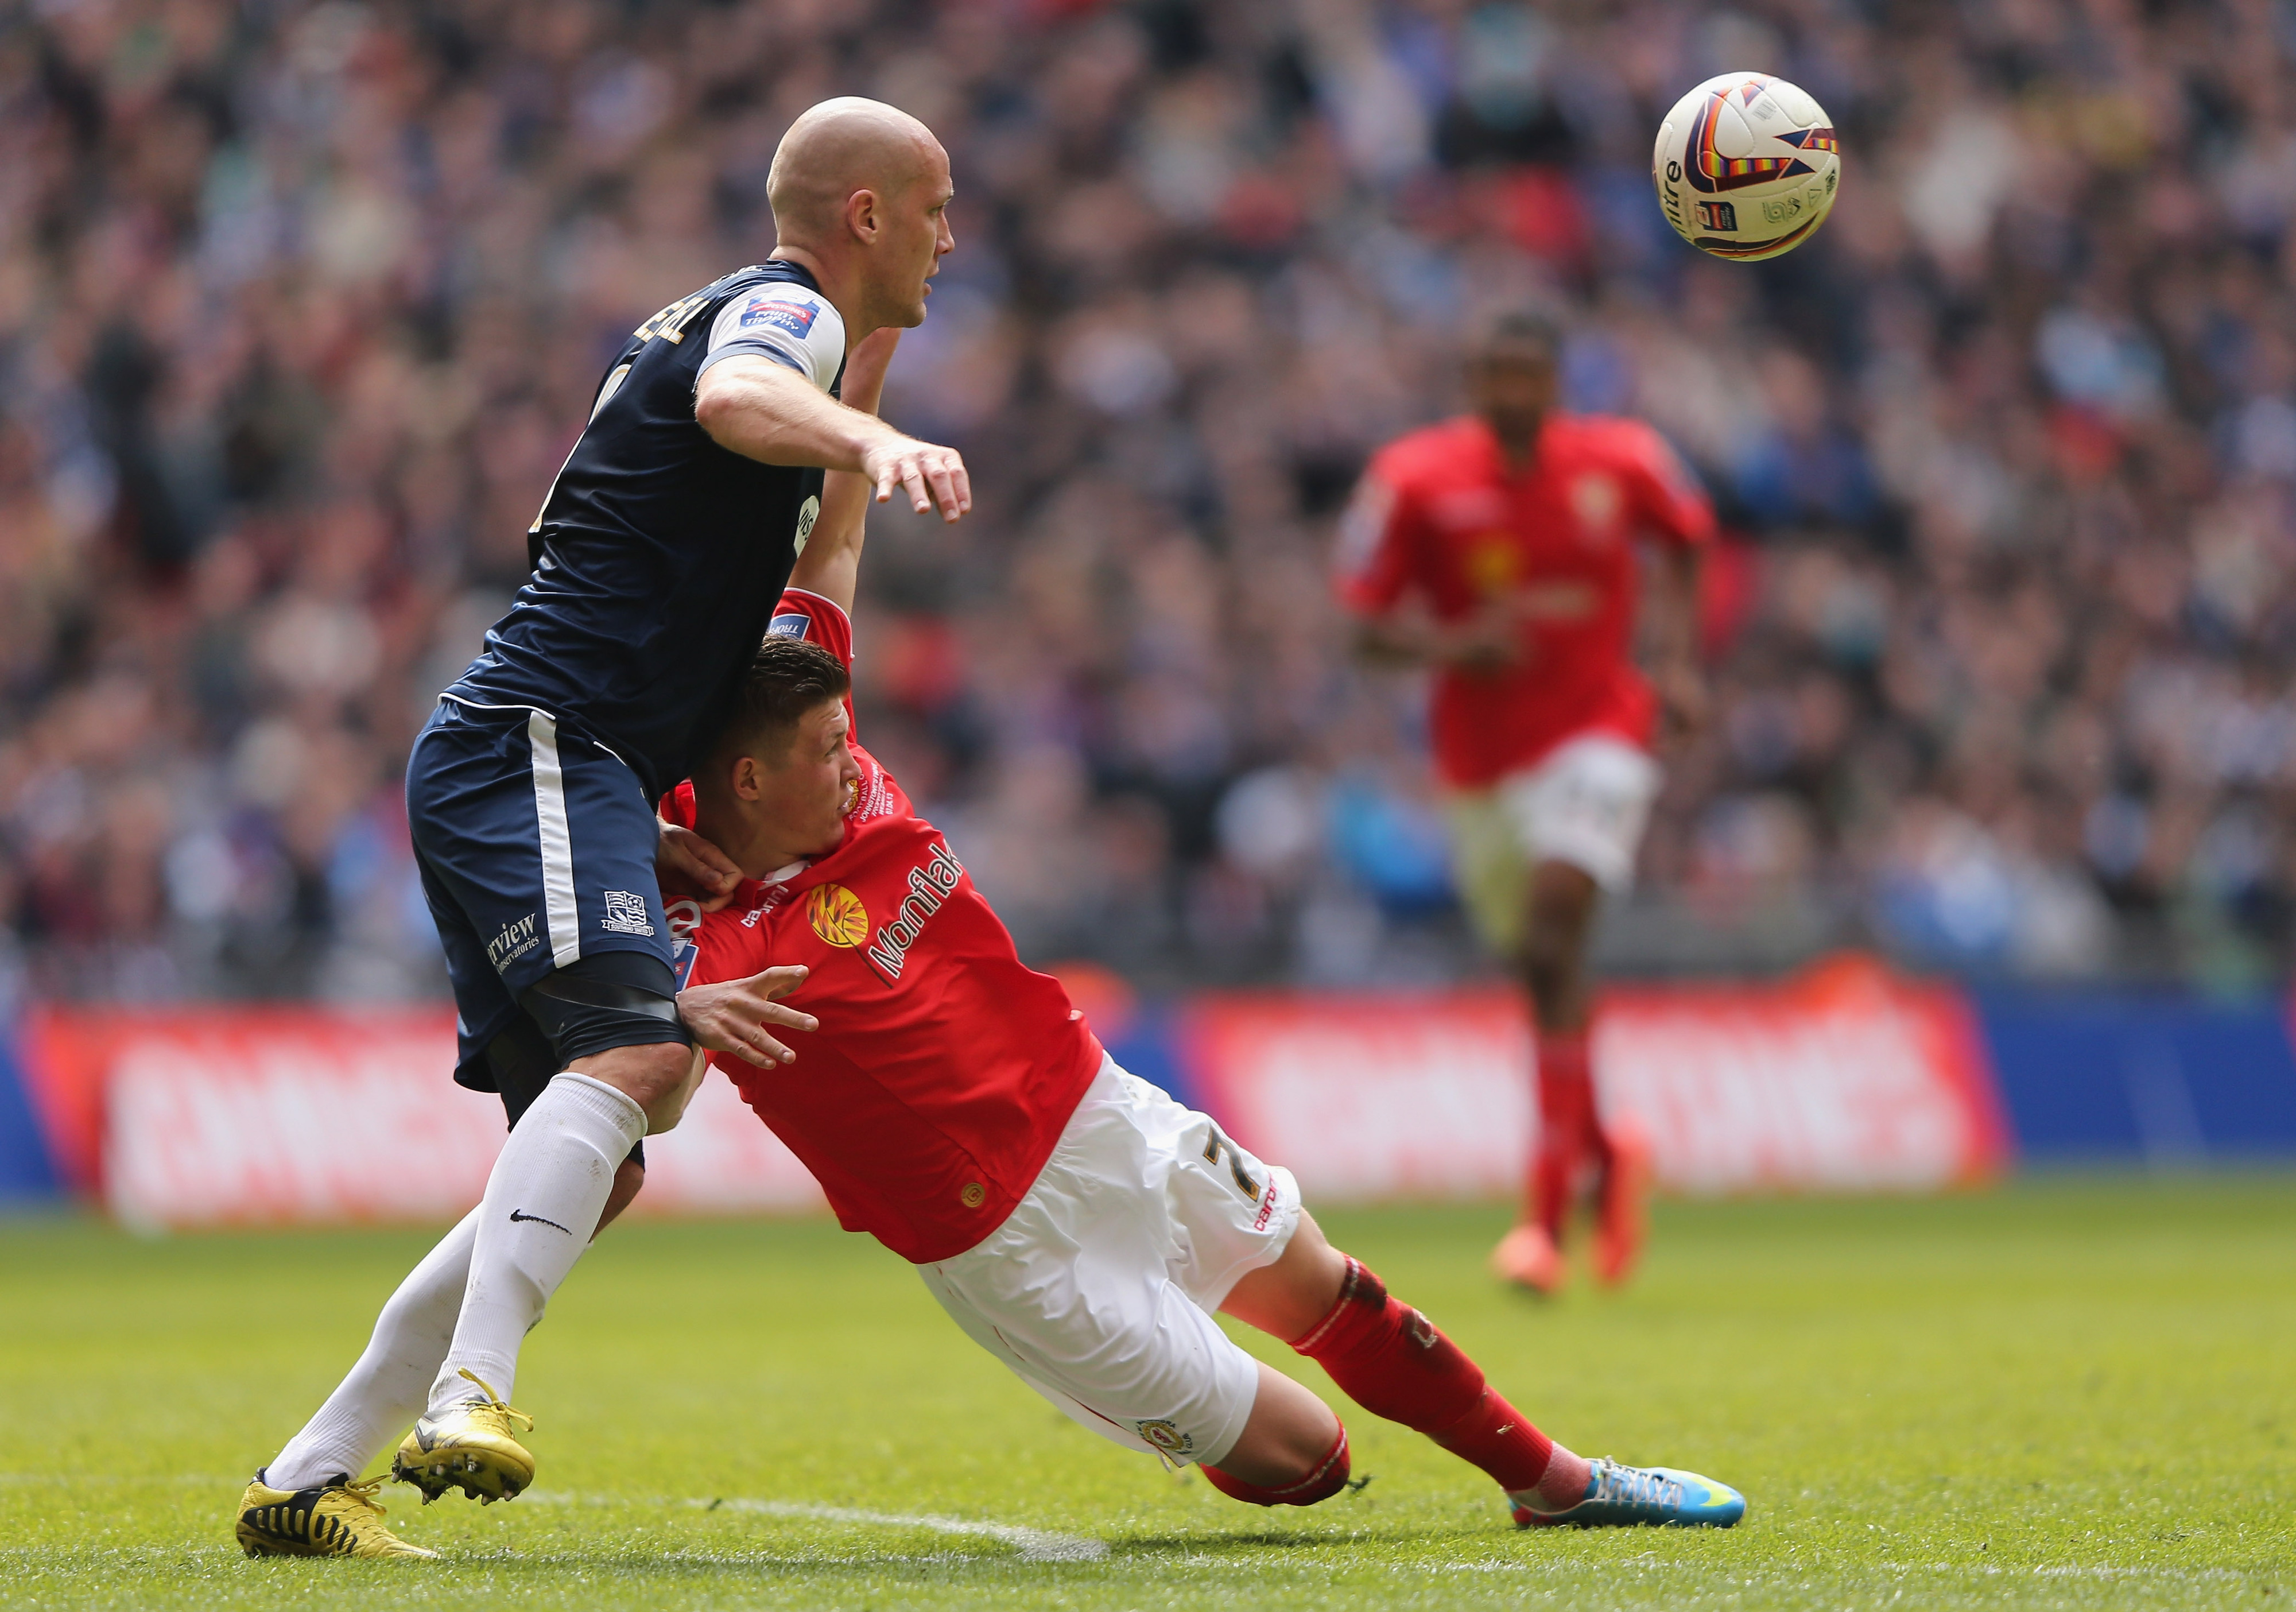 Max Clayton falls down even better than Beckford!